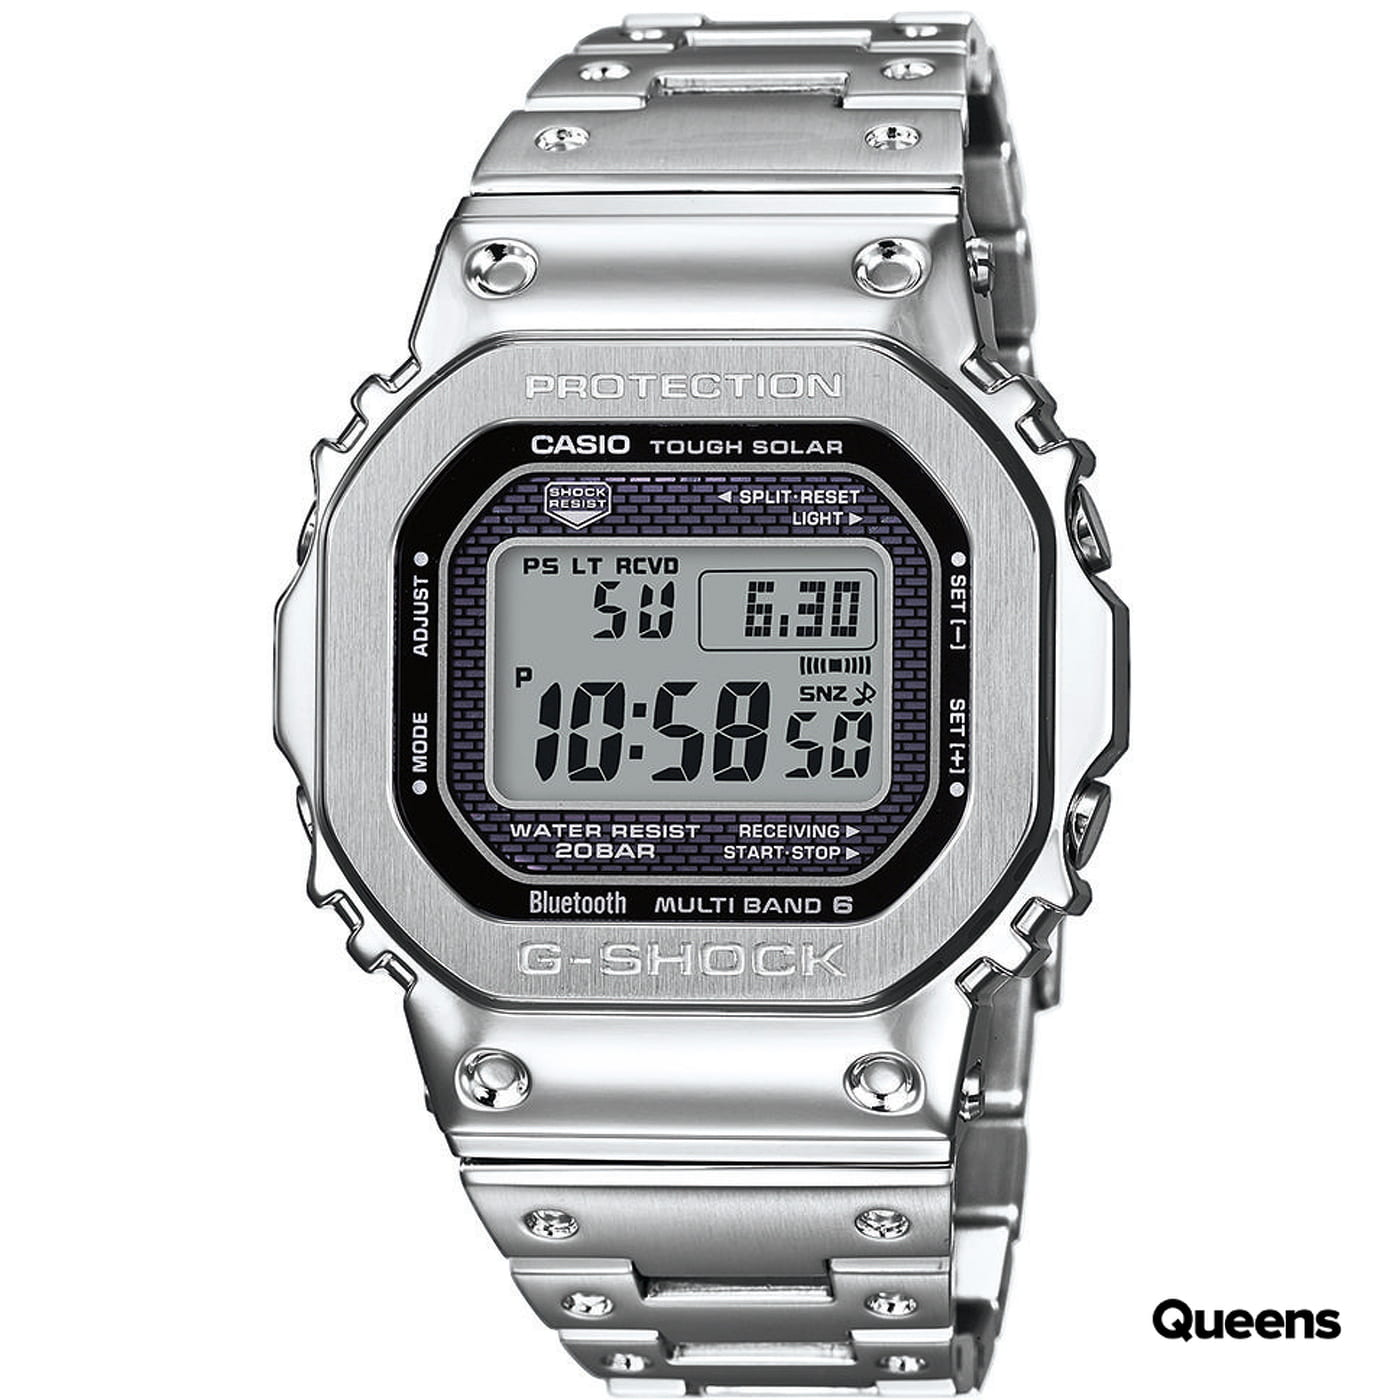 Casio G-Shock GMW B5000D-1ER silver